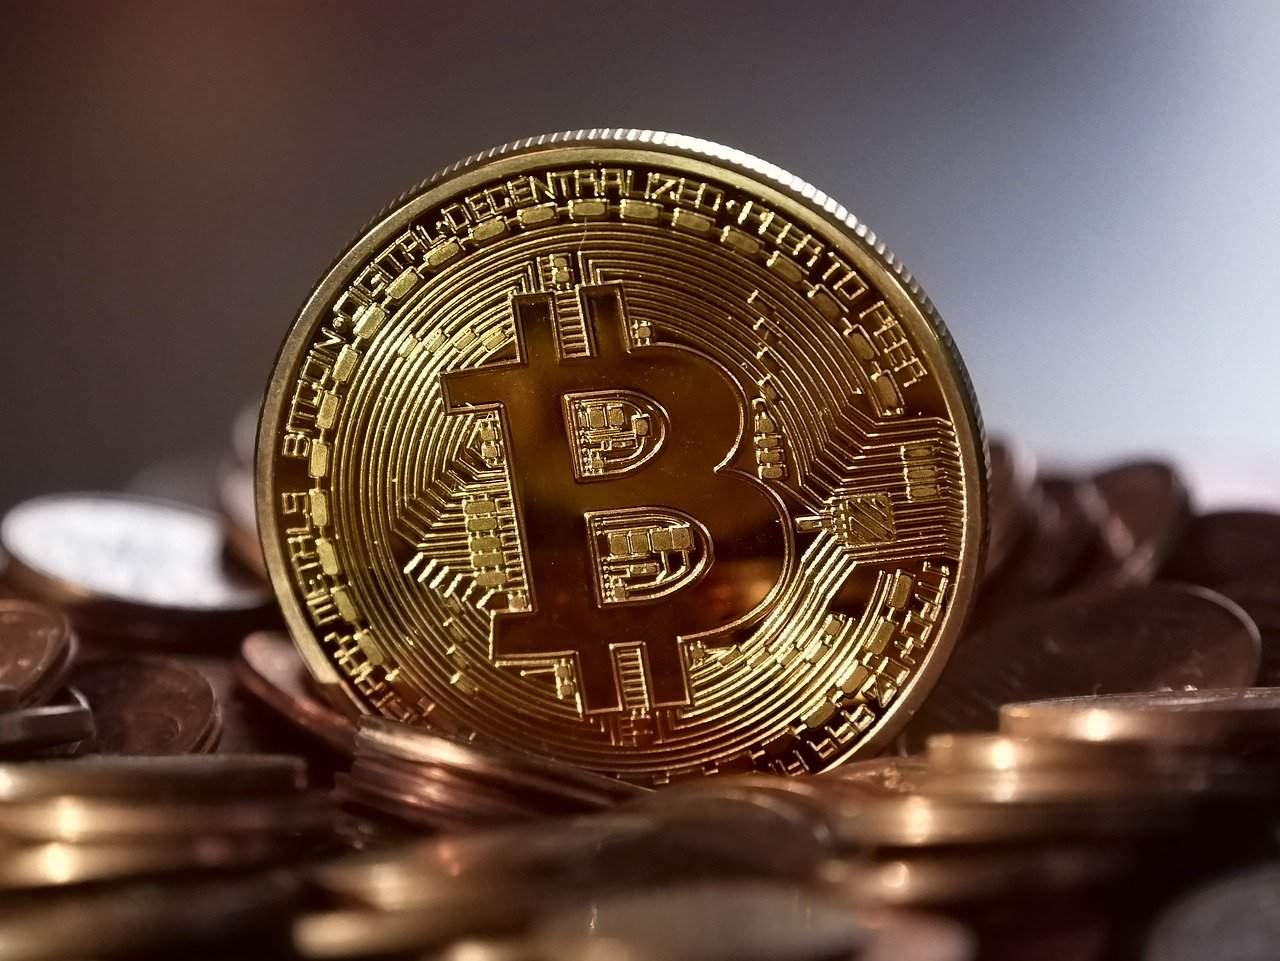 Bitcoins Bullen-Trend intakt – wann nächste Run auf 10.000 Dollar?